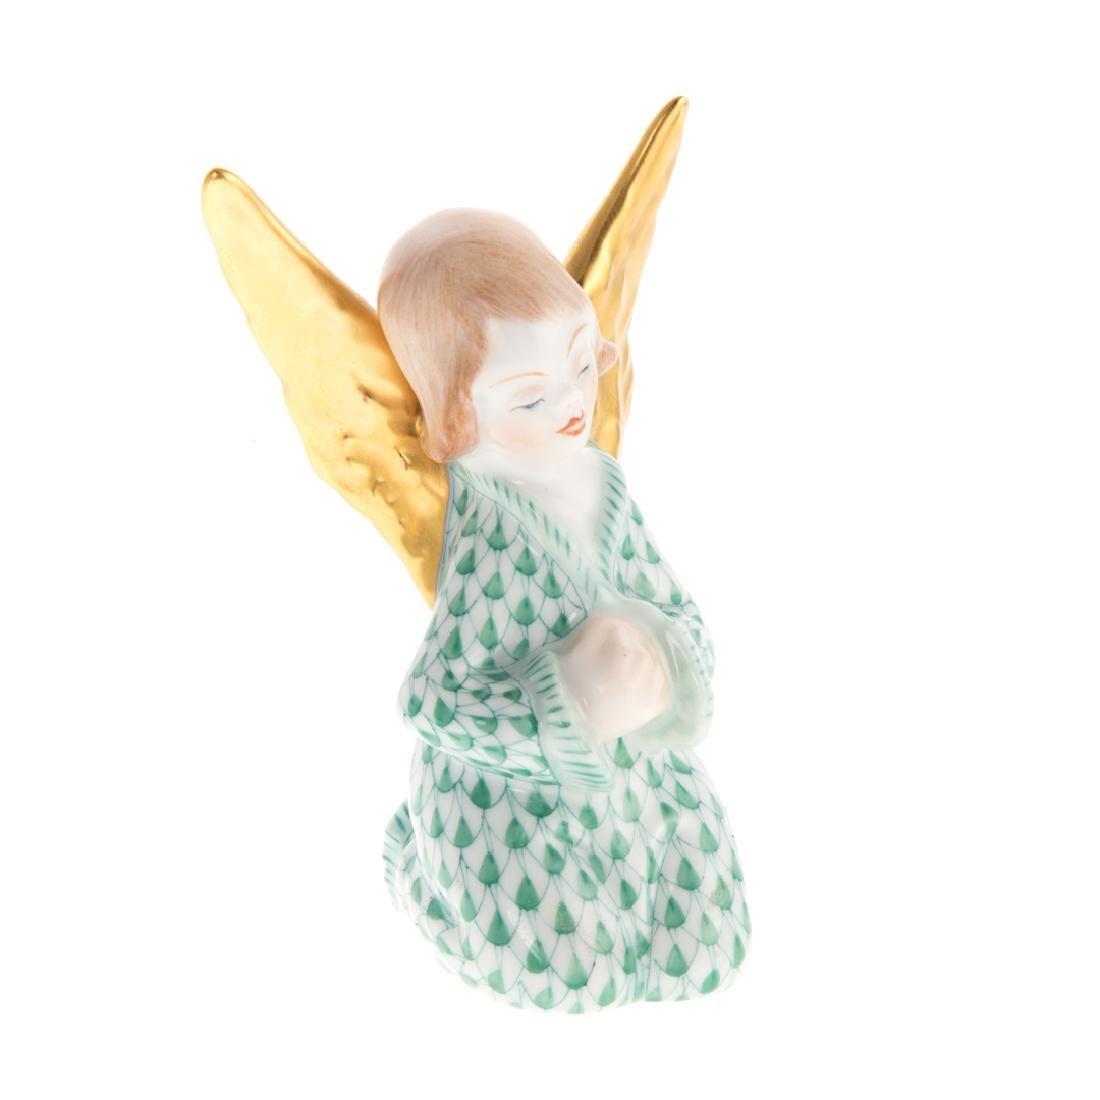 Four Herend porcelain figures - 3